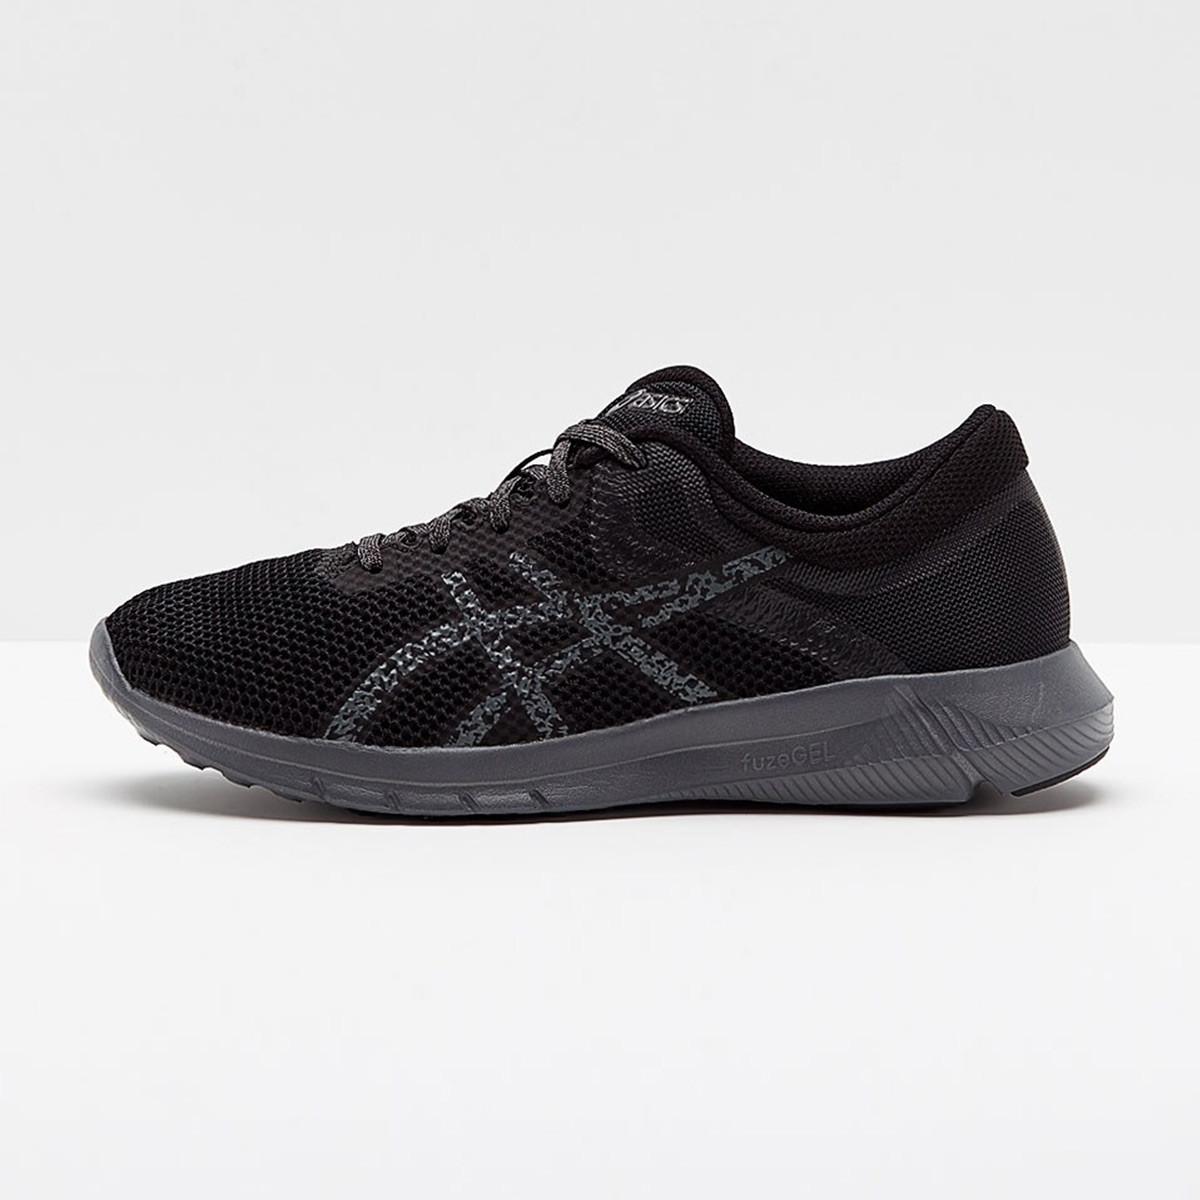 Nitrofuze 2 女款缓震轻透休闲运动鞋跑鞋女鞋